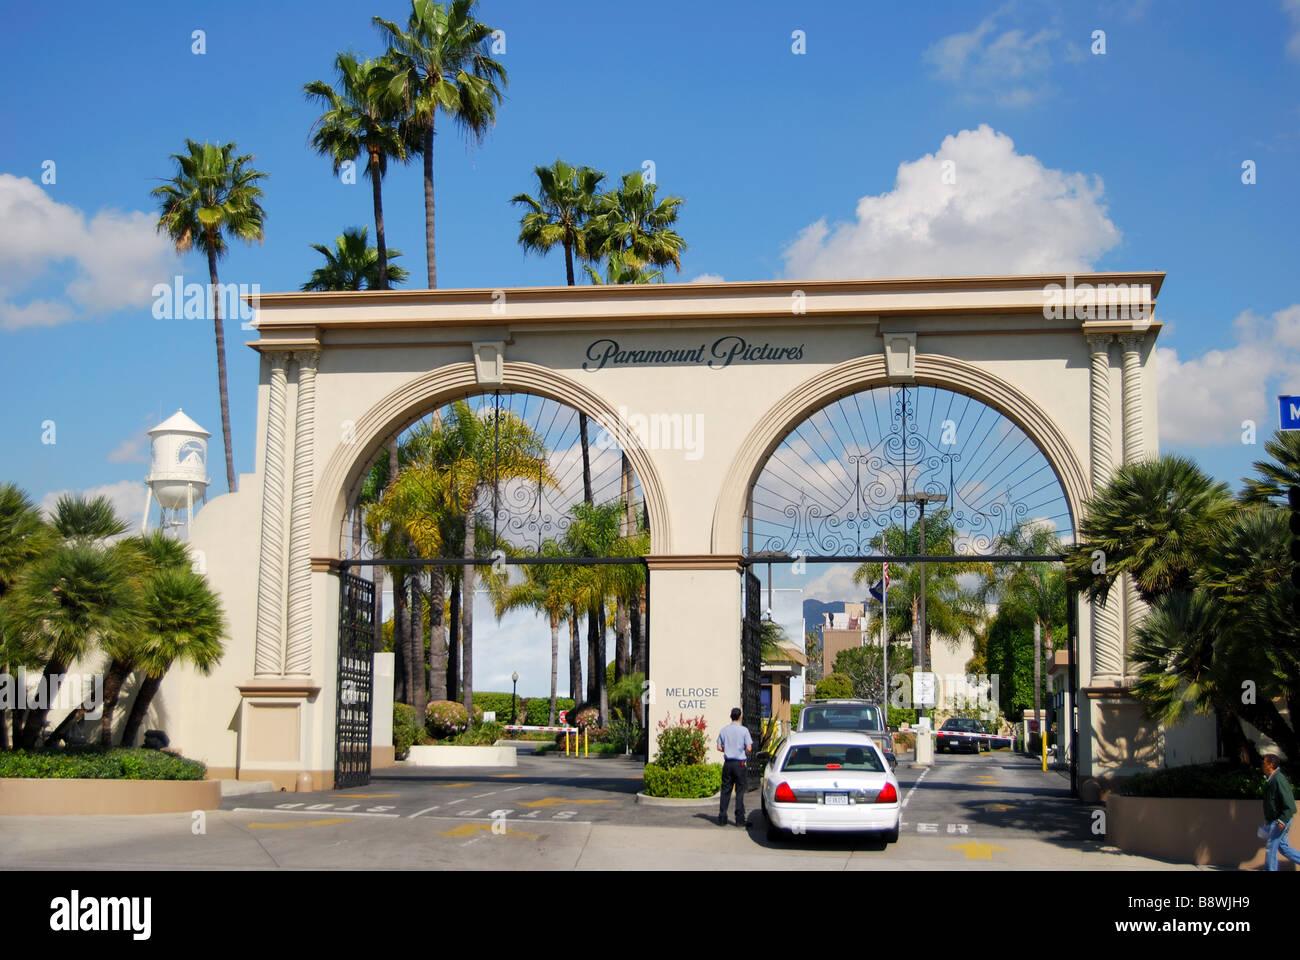 Entrance to Paramount Studios, Melrose Avenue, Hollywood, Los Angeles, California, United States of AmericaStock Photo